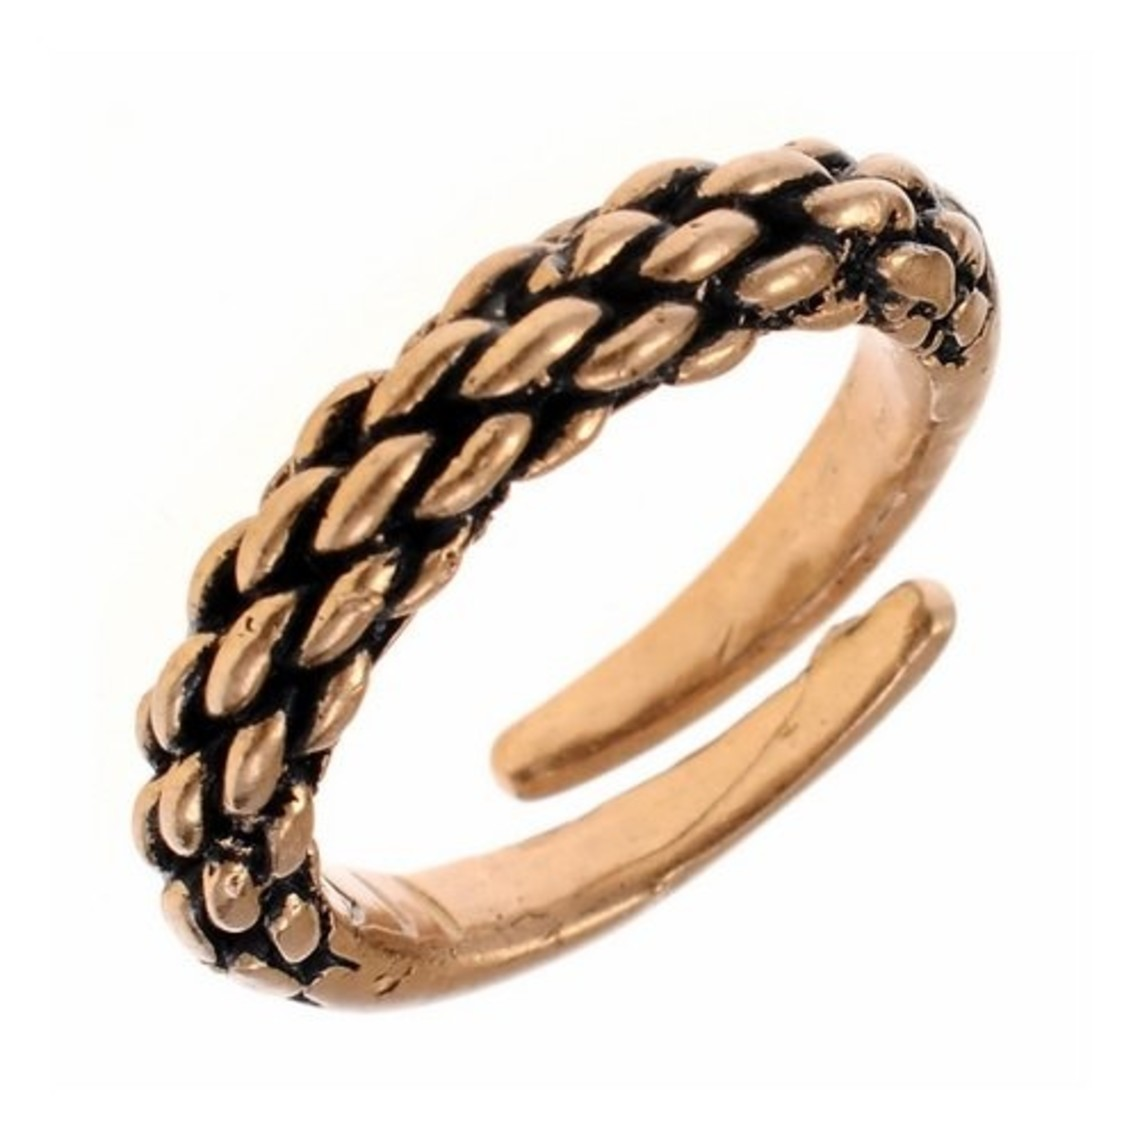 9th-10th century Viking ring, bronze